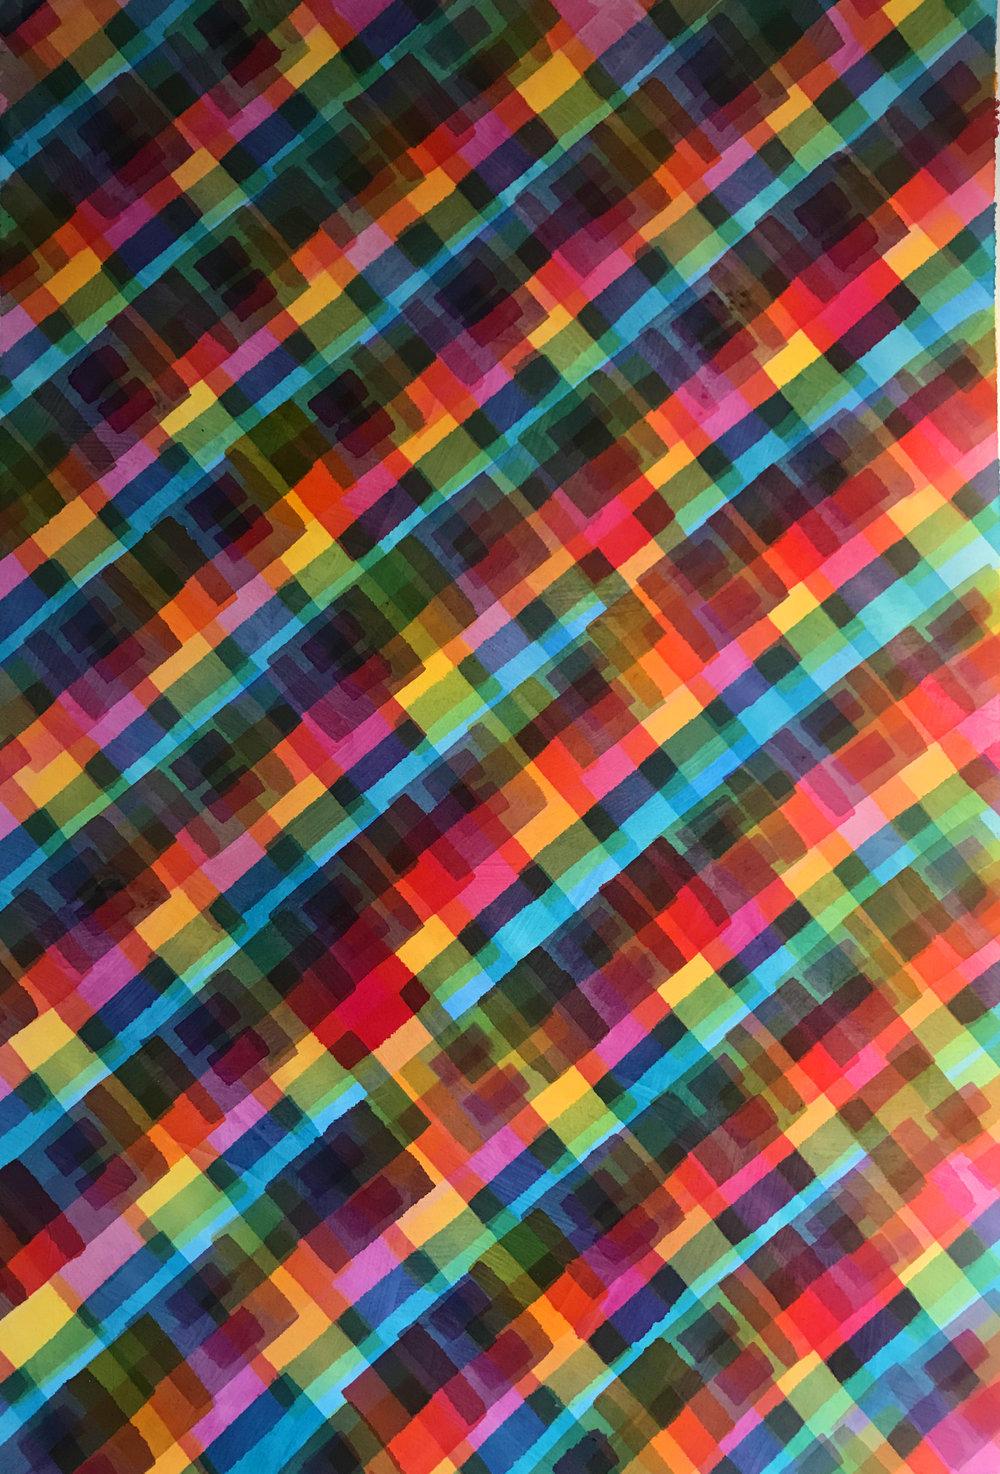 Ling Bao_Untitled_Acrylic on Paper_25 x 17.jpg